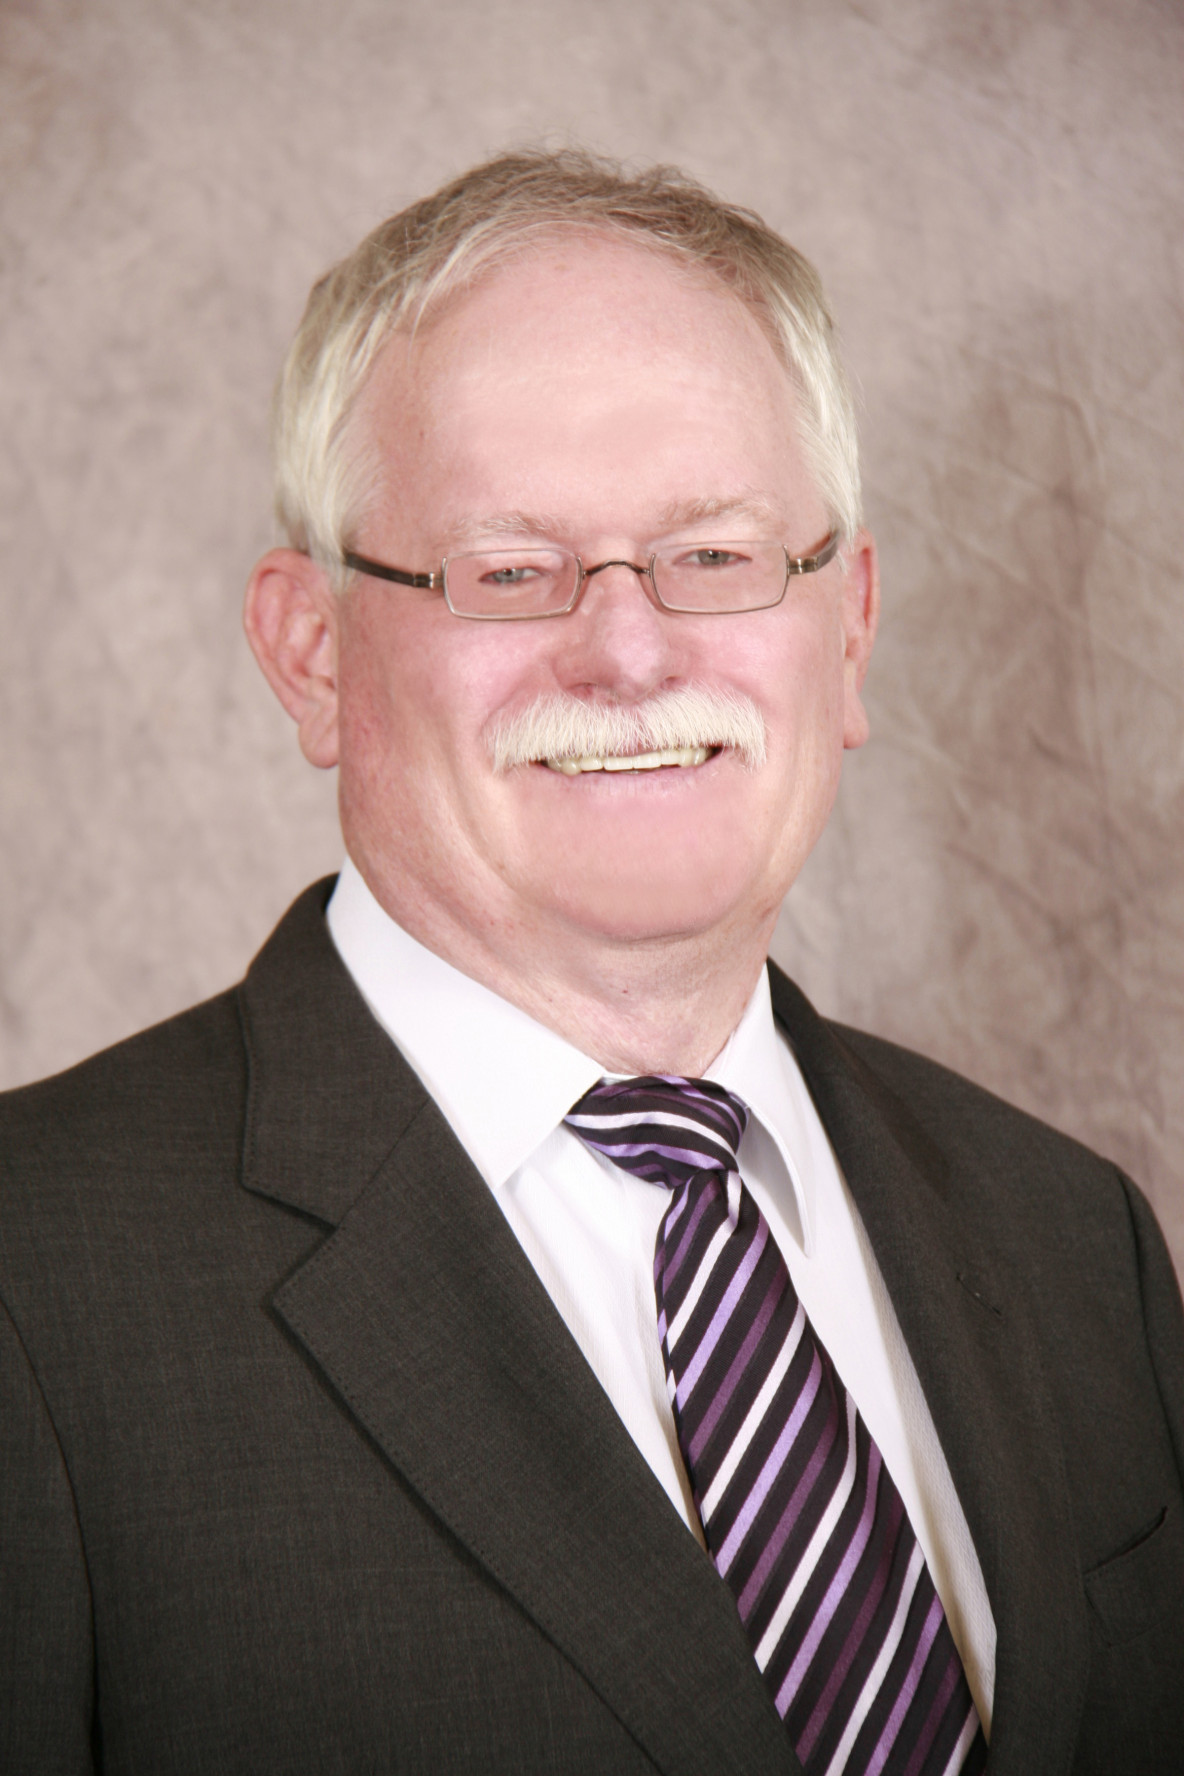 Byron E. Townsend, Lawyer tate Disability Retirement